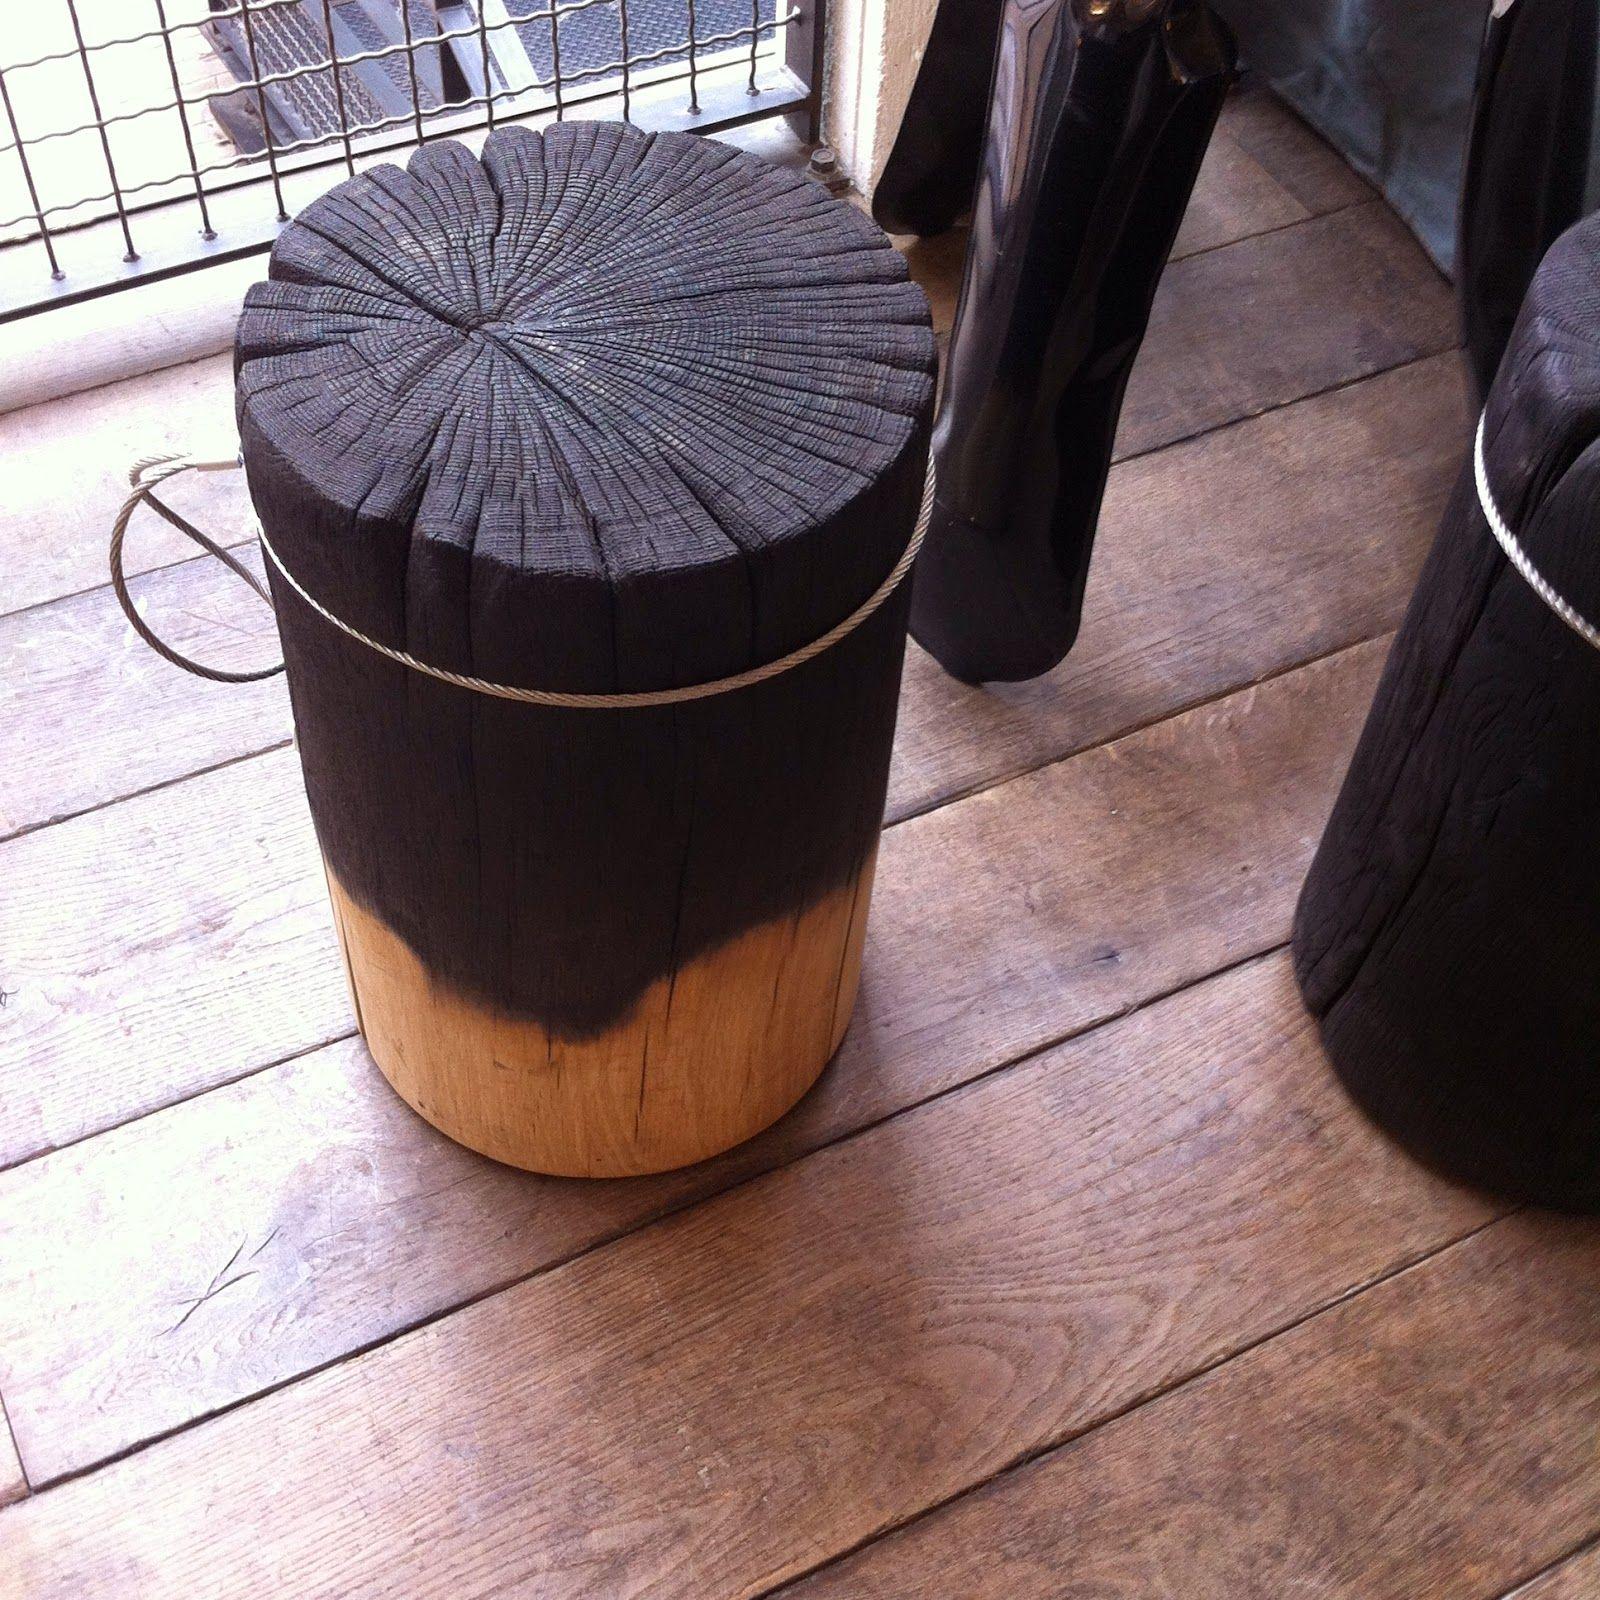 tendance bois brul influences pinterest bois brul tendance et bois. Black Bedroom Furniture Sets. Home Design Ideas